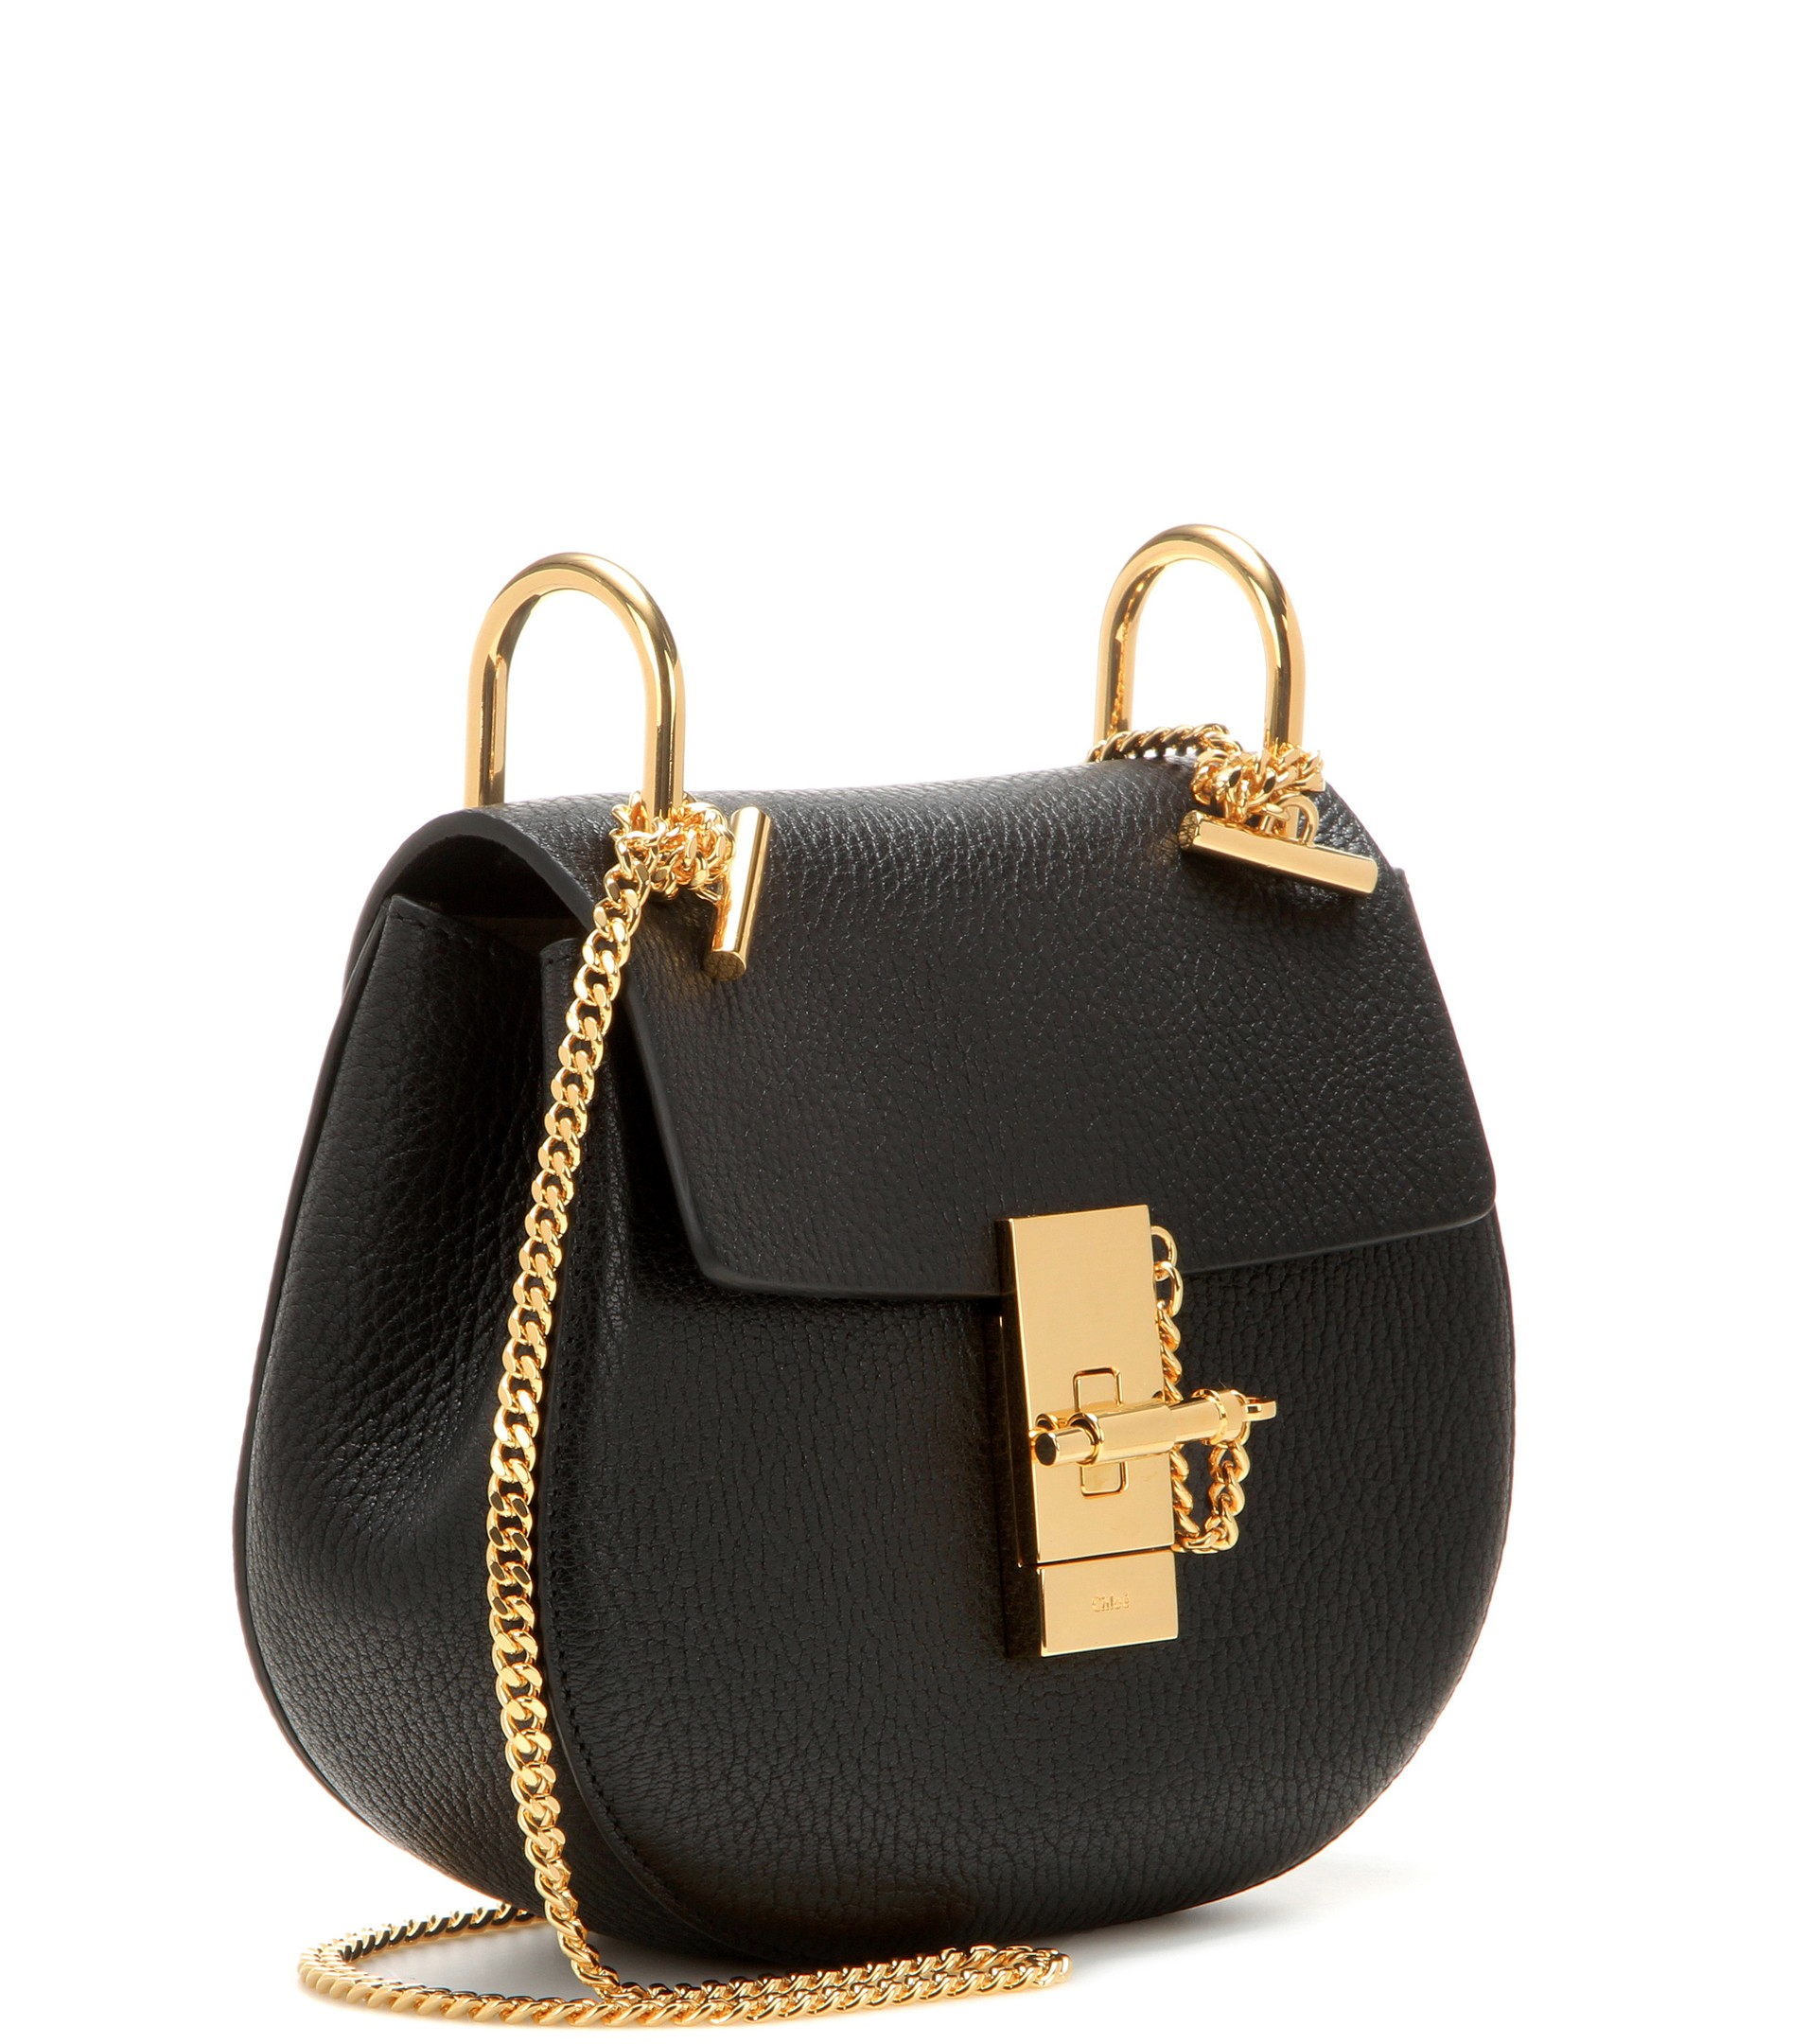 chloe replica bags - Chlo�� Drew Mini Leather Shoulder Bag in Black | Lyst